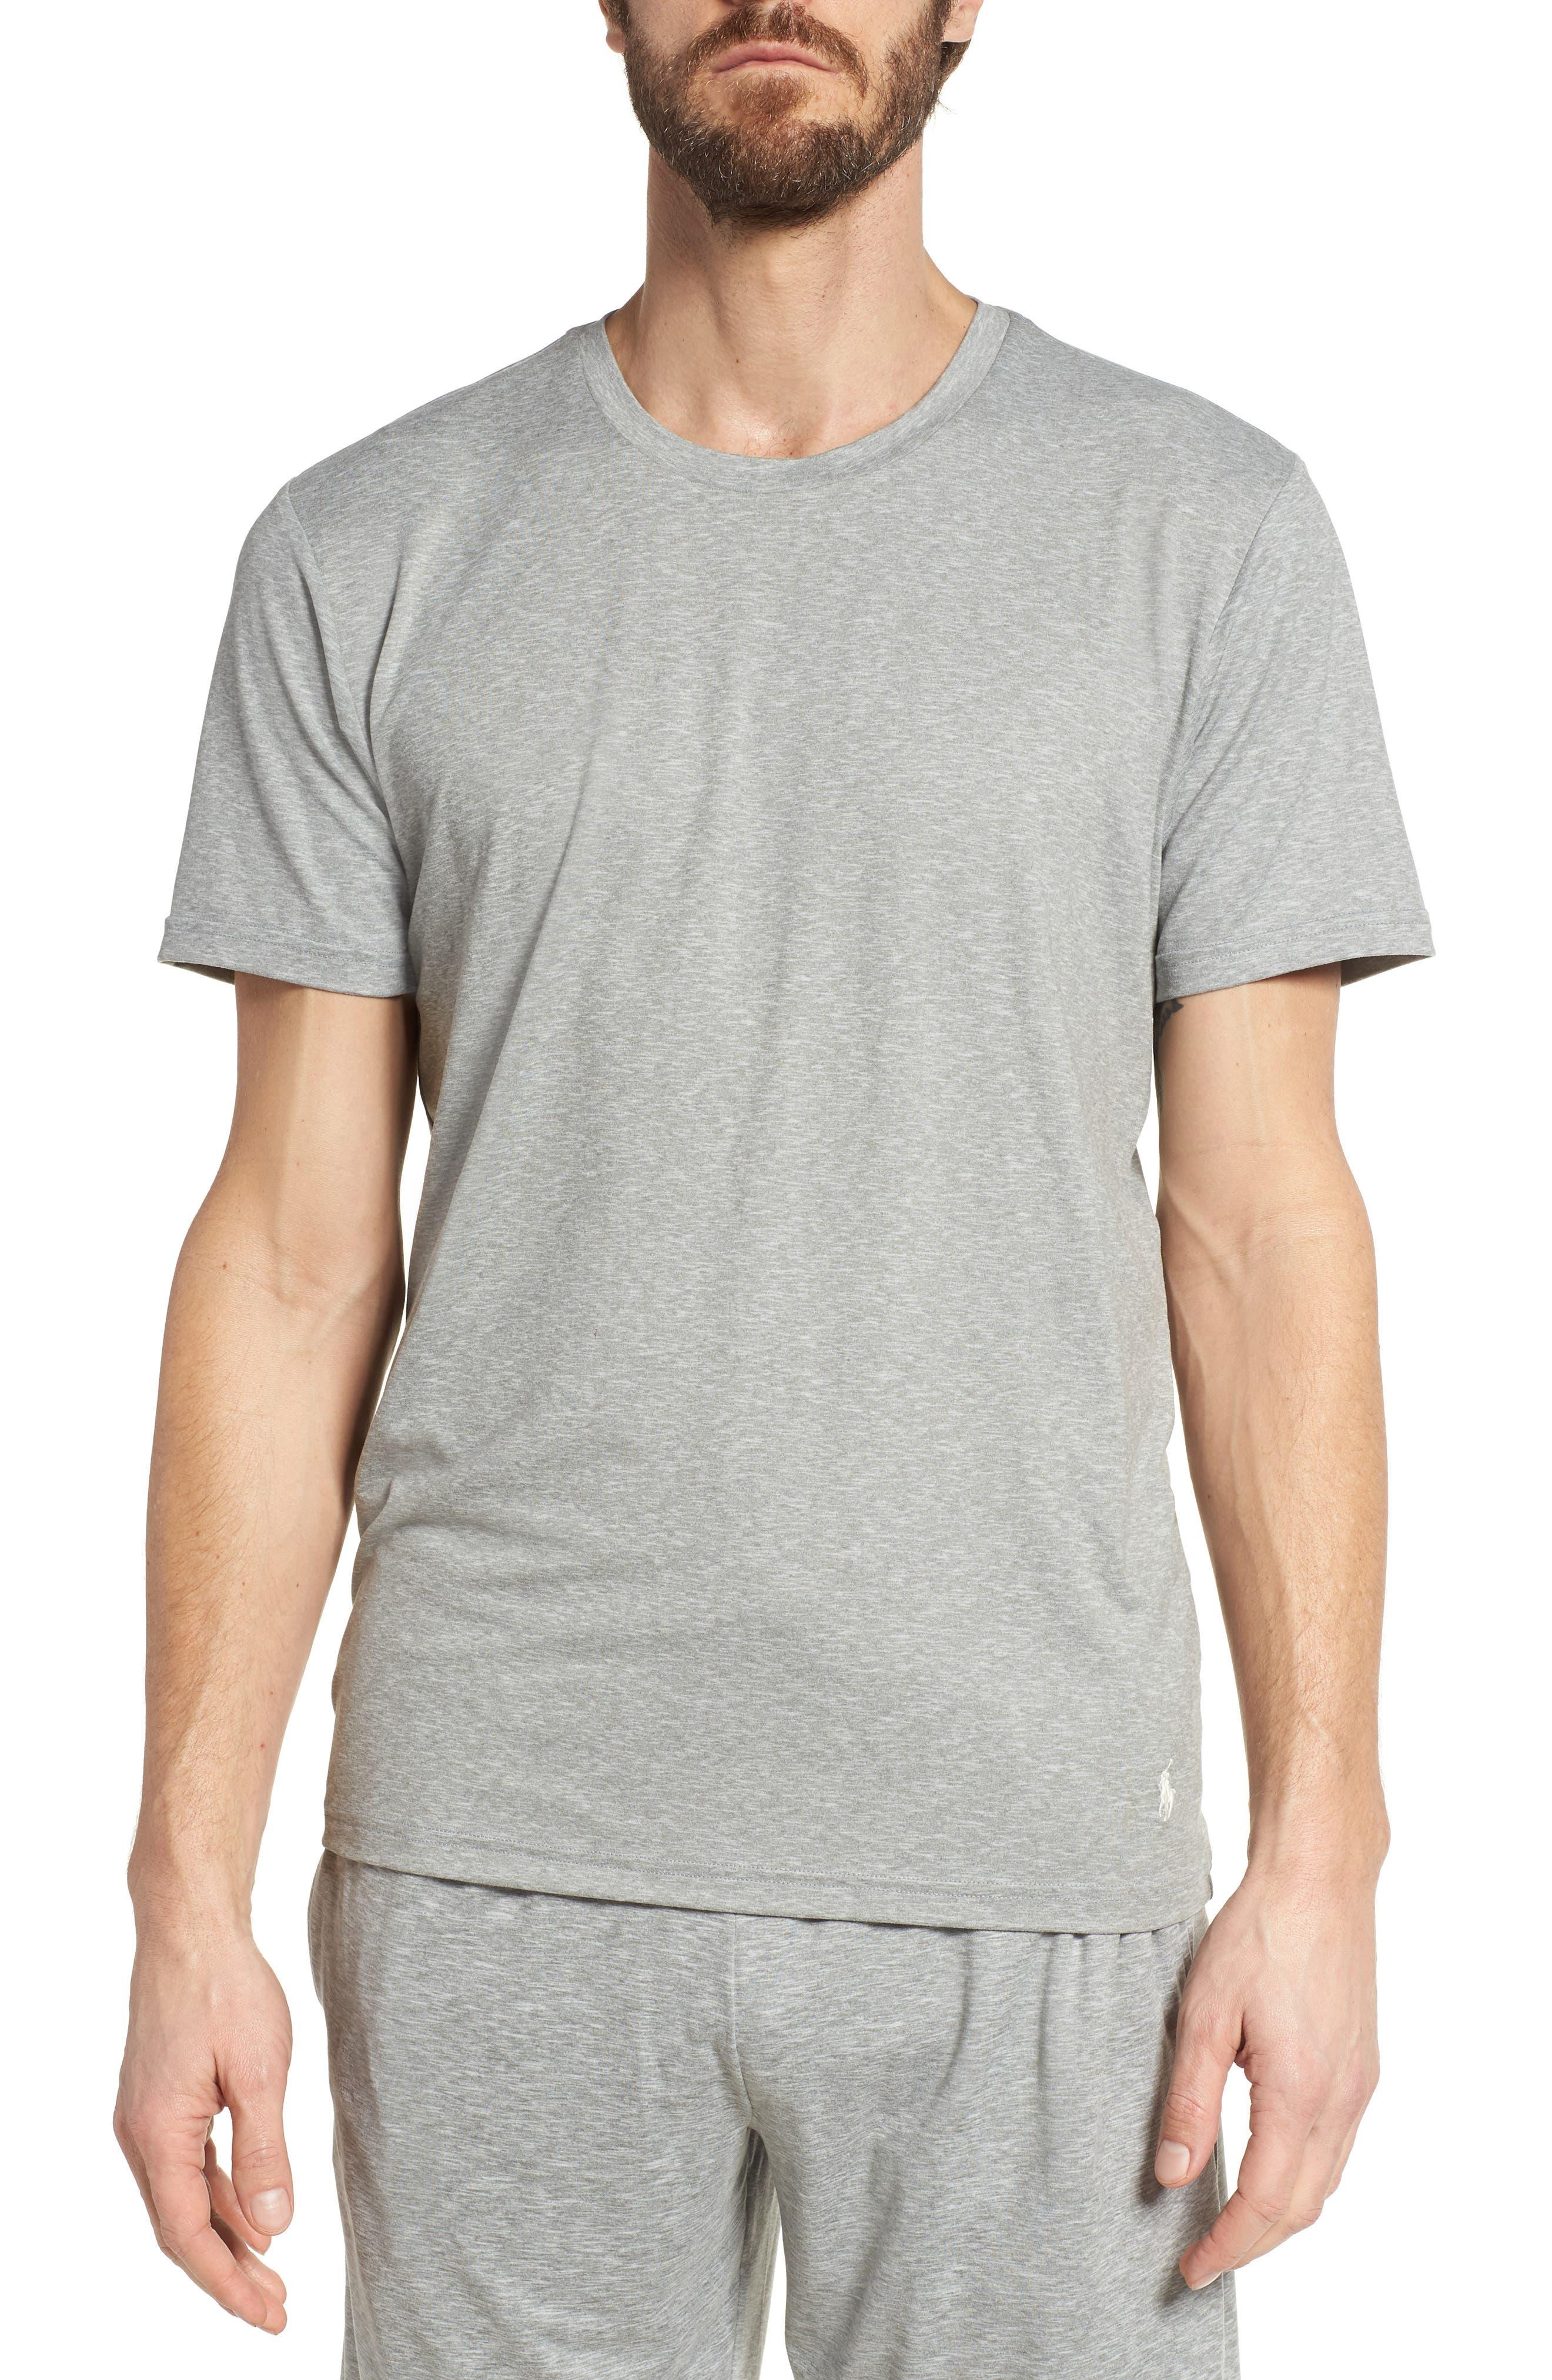 Therma Sleep Crewneck T-Shirt,                             Main thumbnail 1, color,                             033